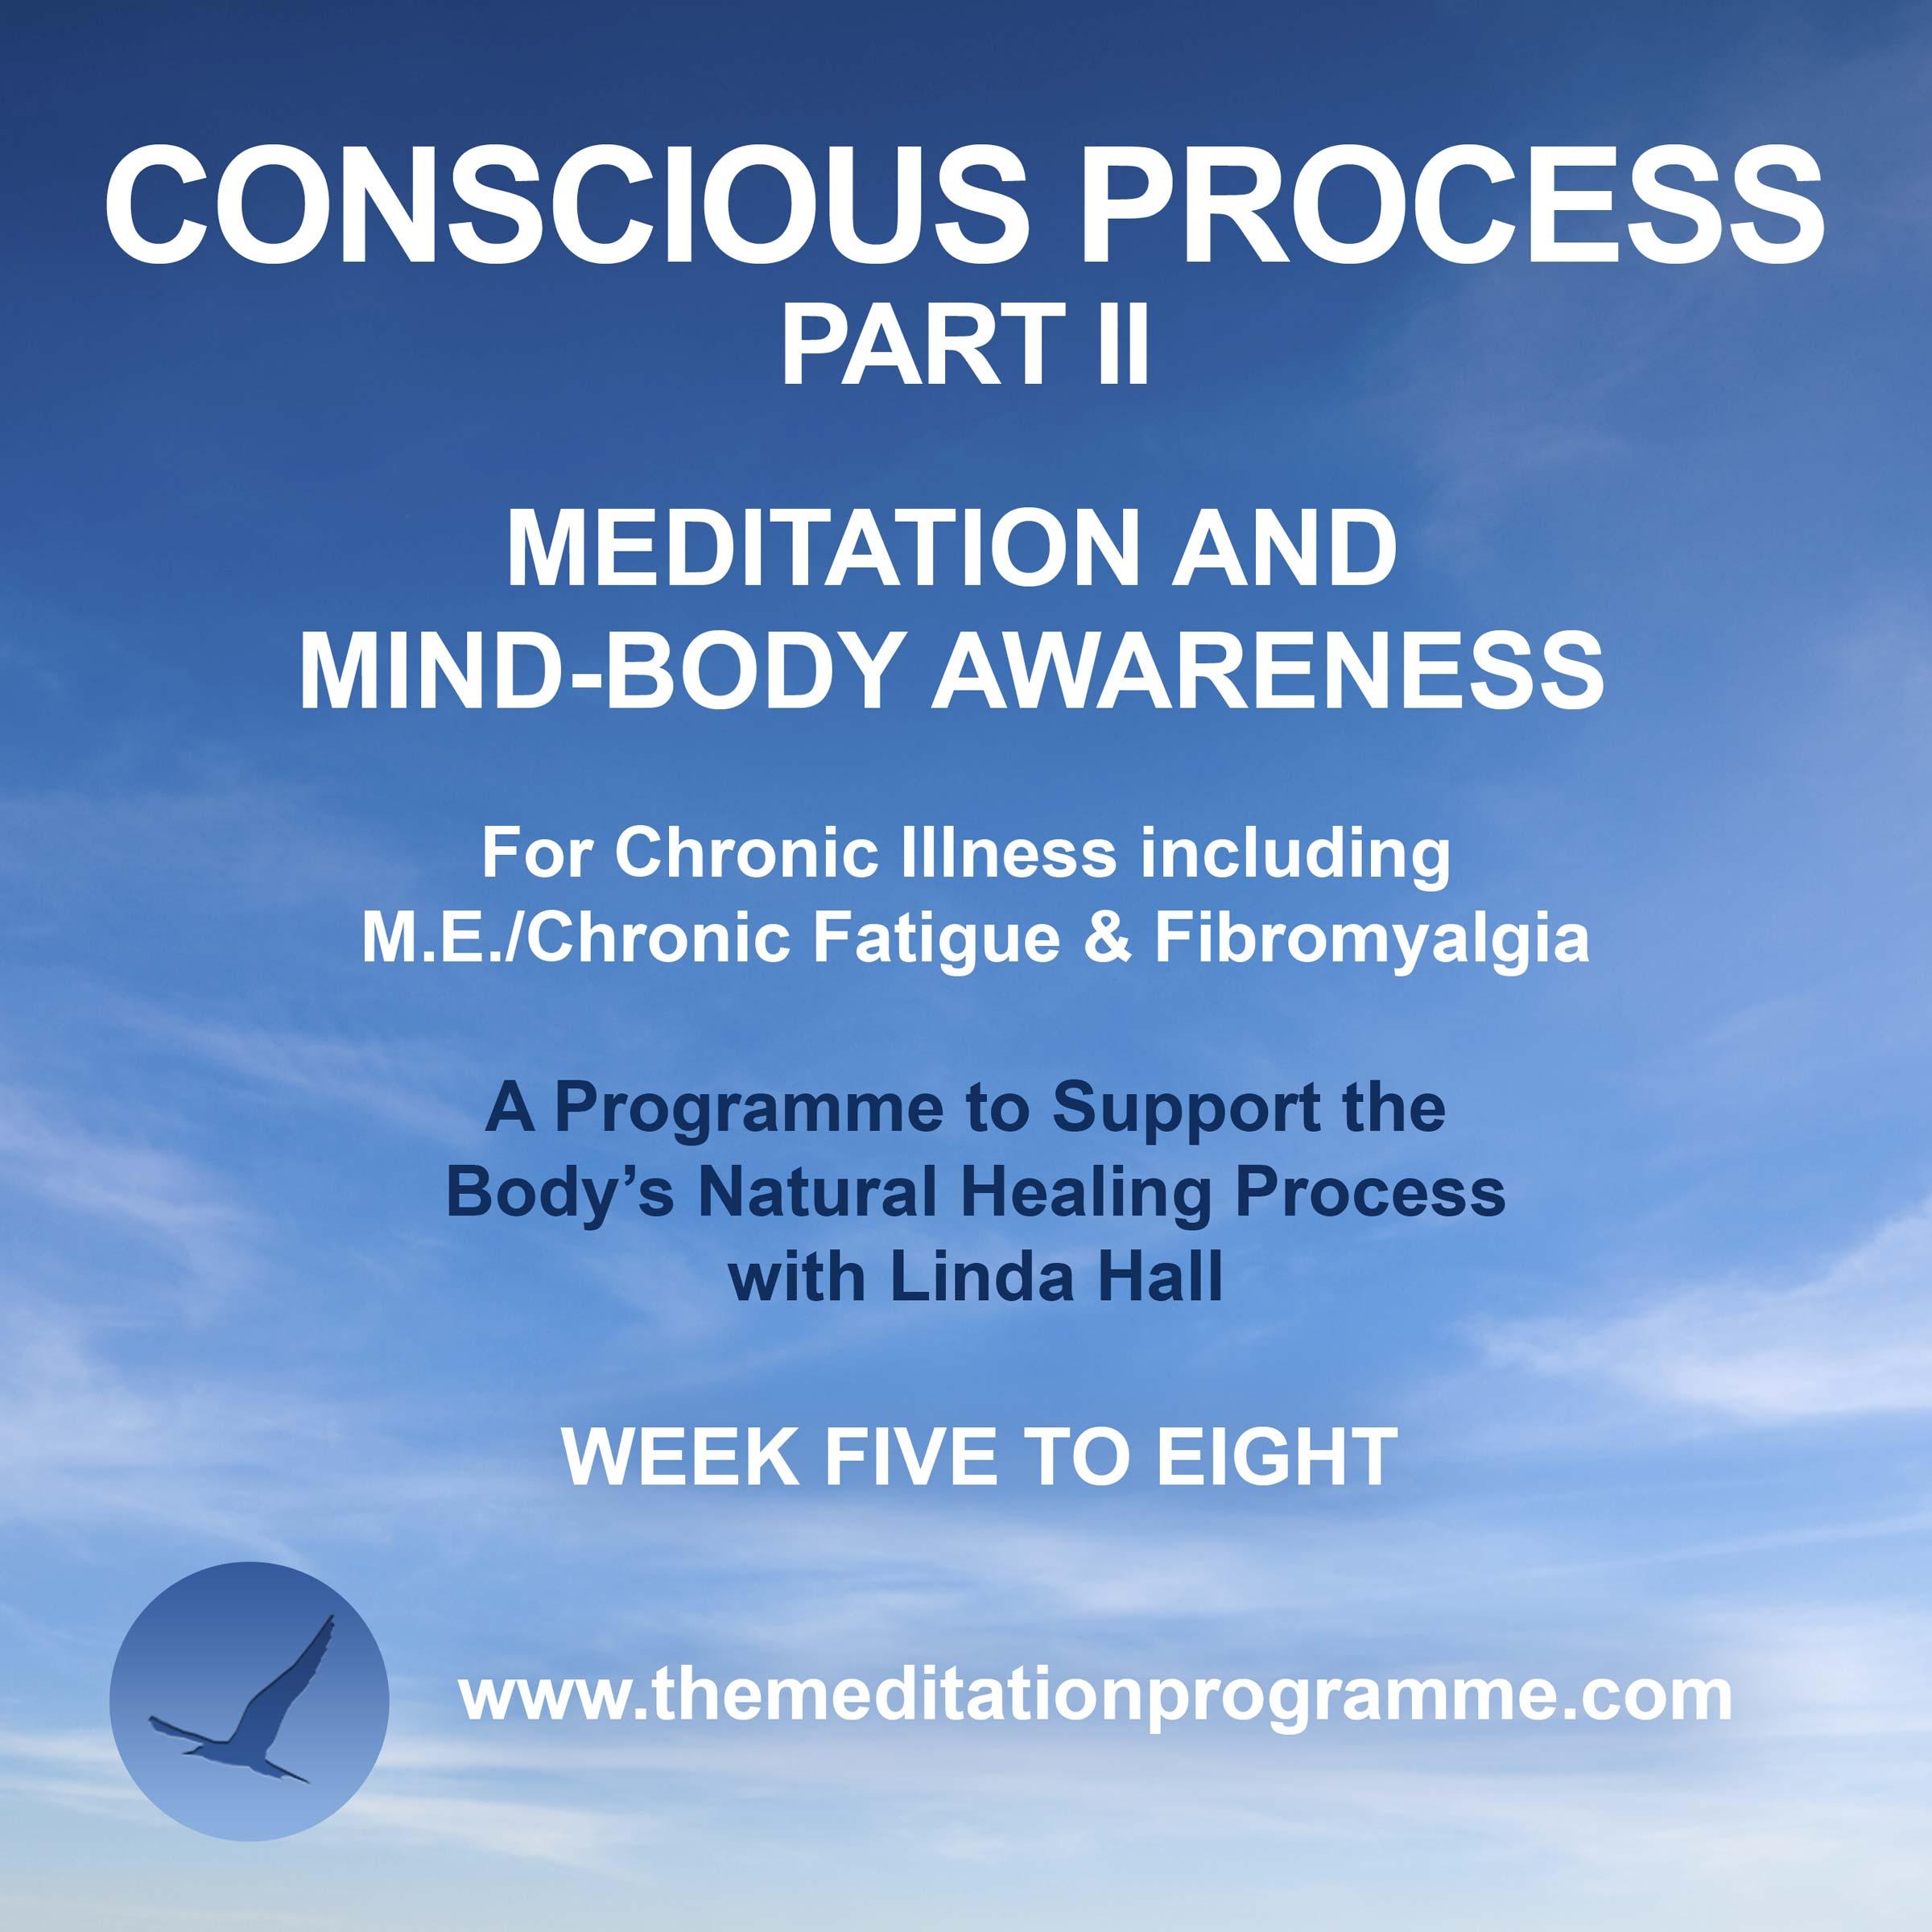 Conscious-Process-Part-2